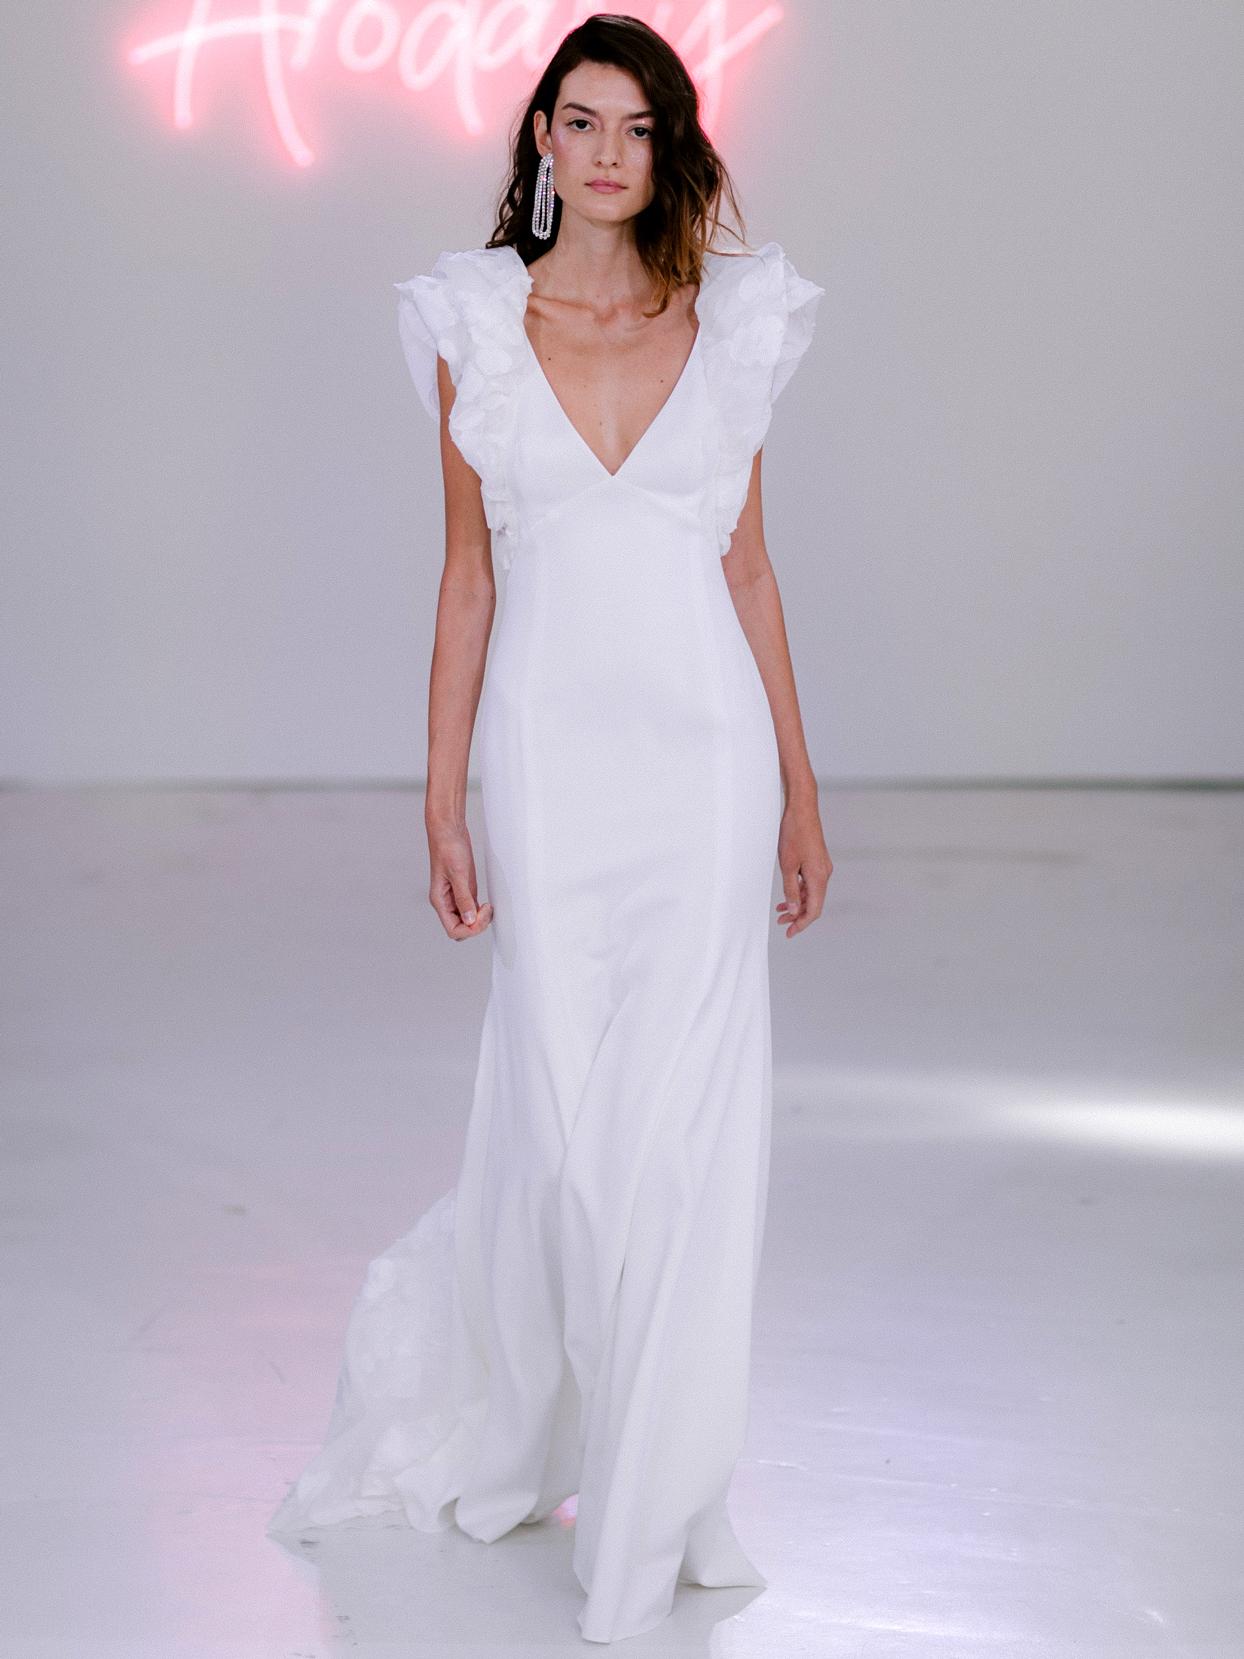 Rime Arodaky X The Mews Bridal deep v-neck short puffed sleeves wedding dress fall 2020